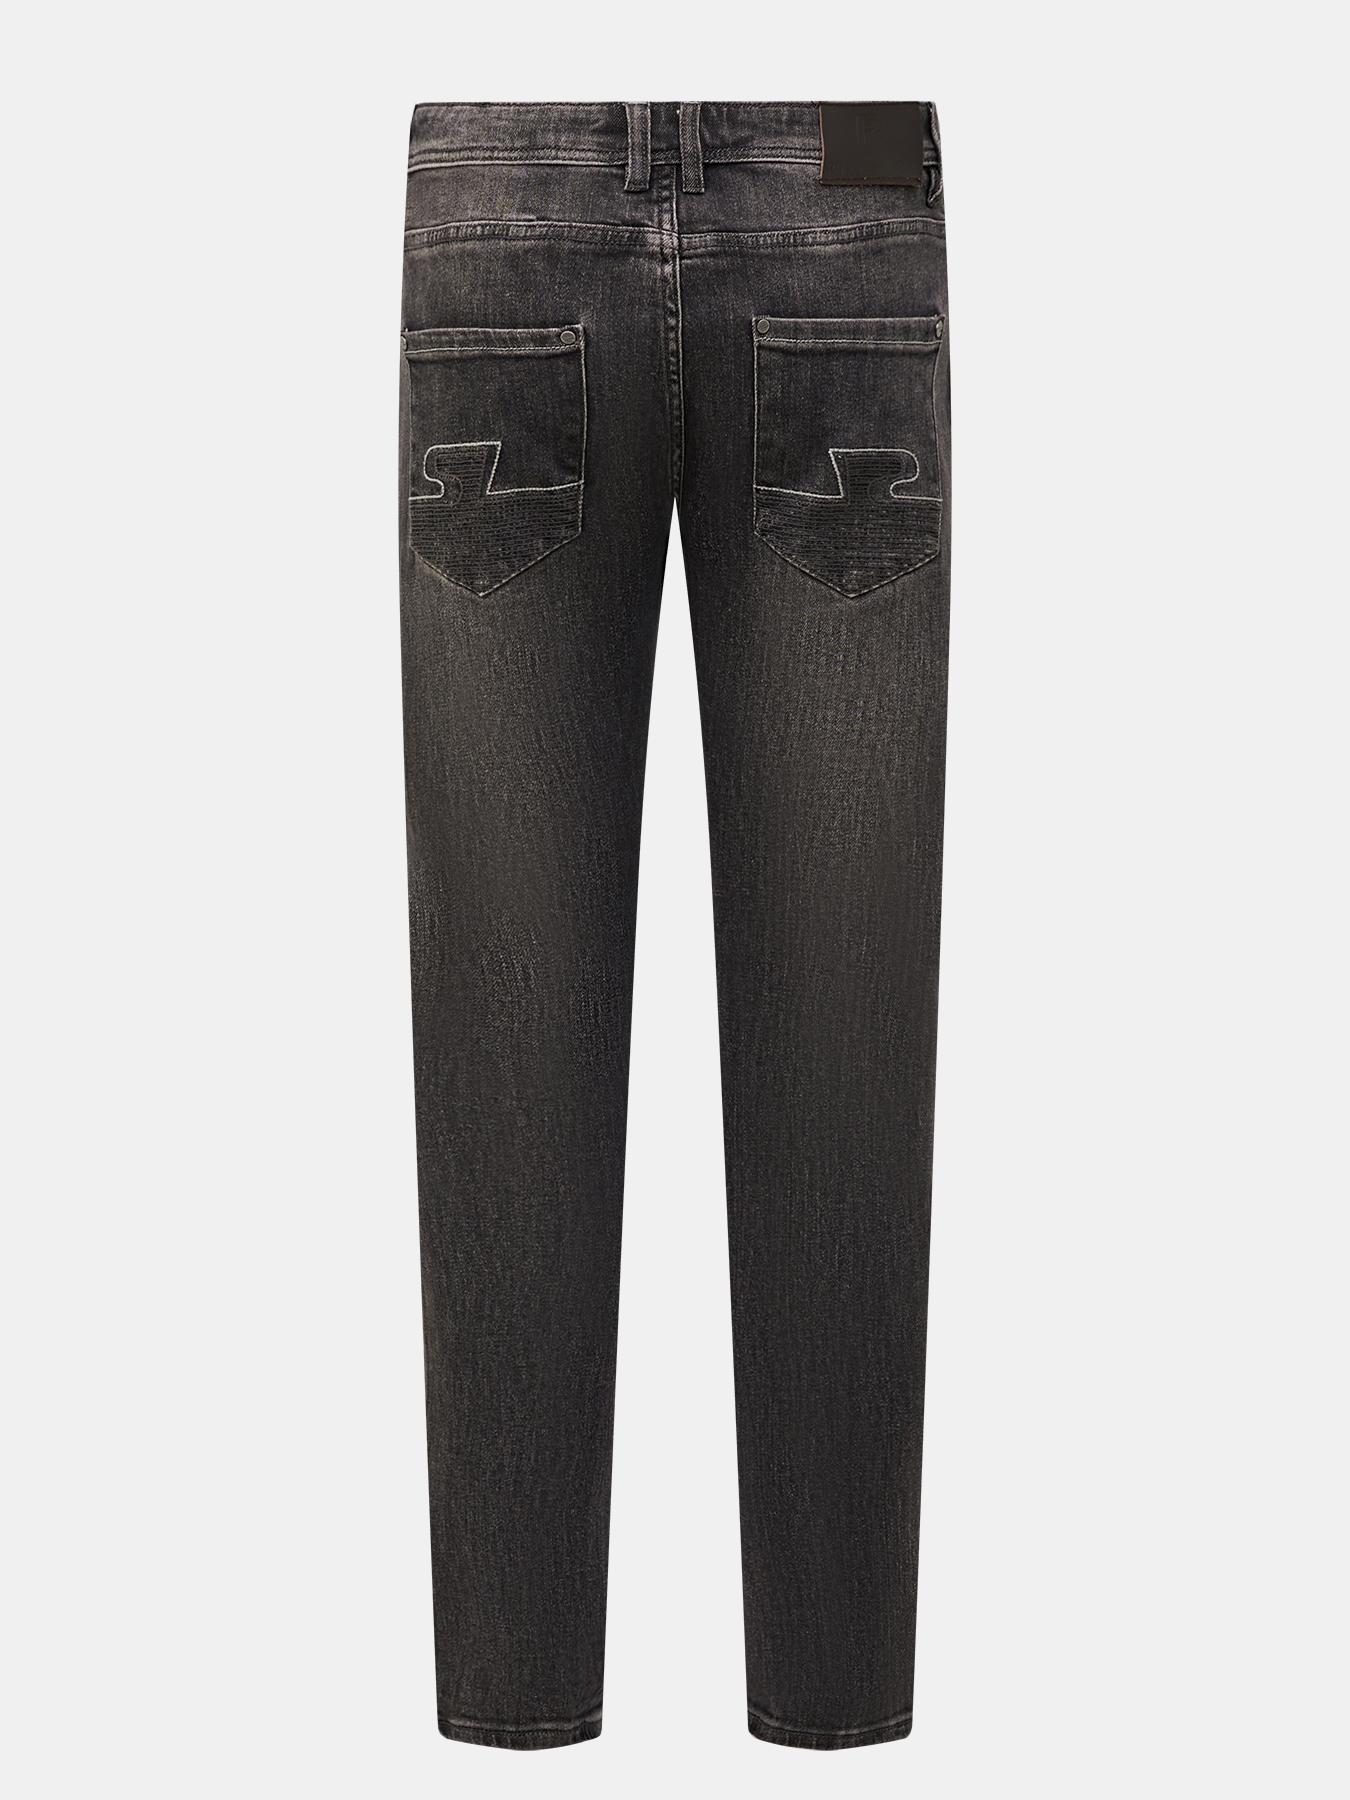 Брюки Ritter Jeans Джинсы брюки ritter jeans прямые джинсы